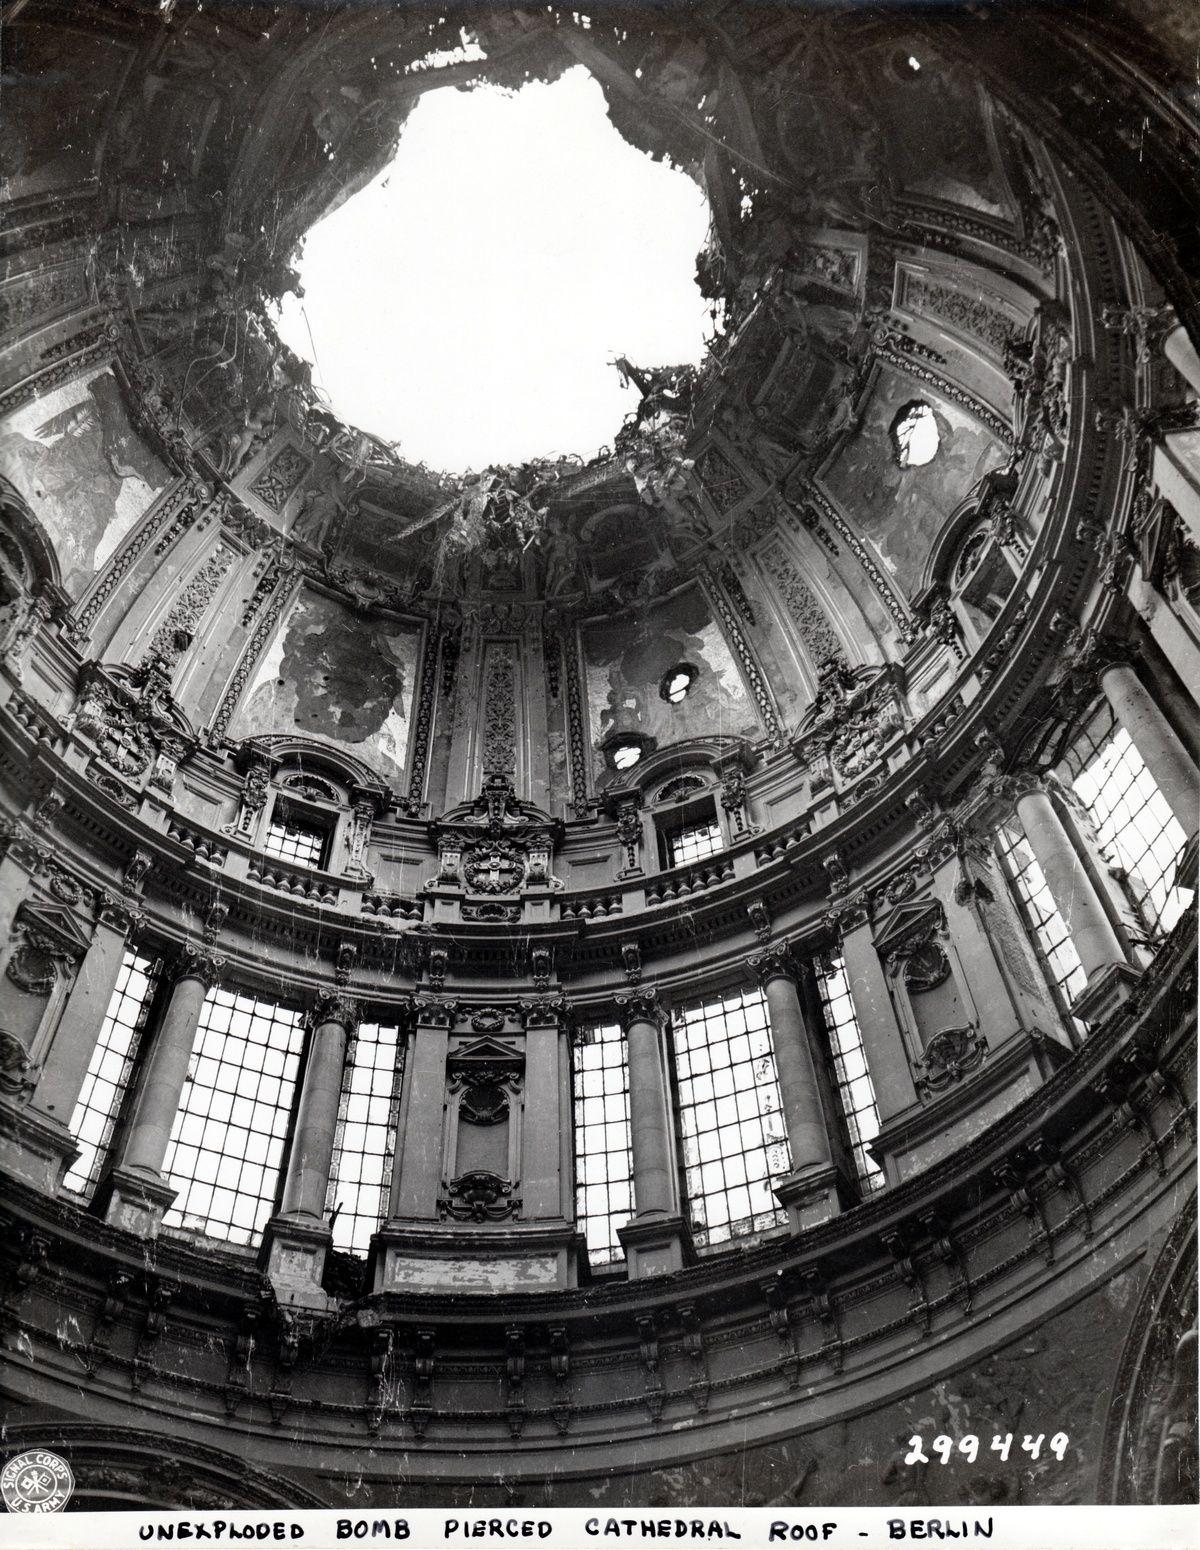 Zerstorung Berlin Geschichte Geschichte Historische Bilder